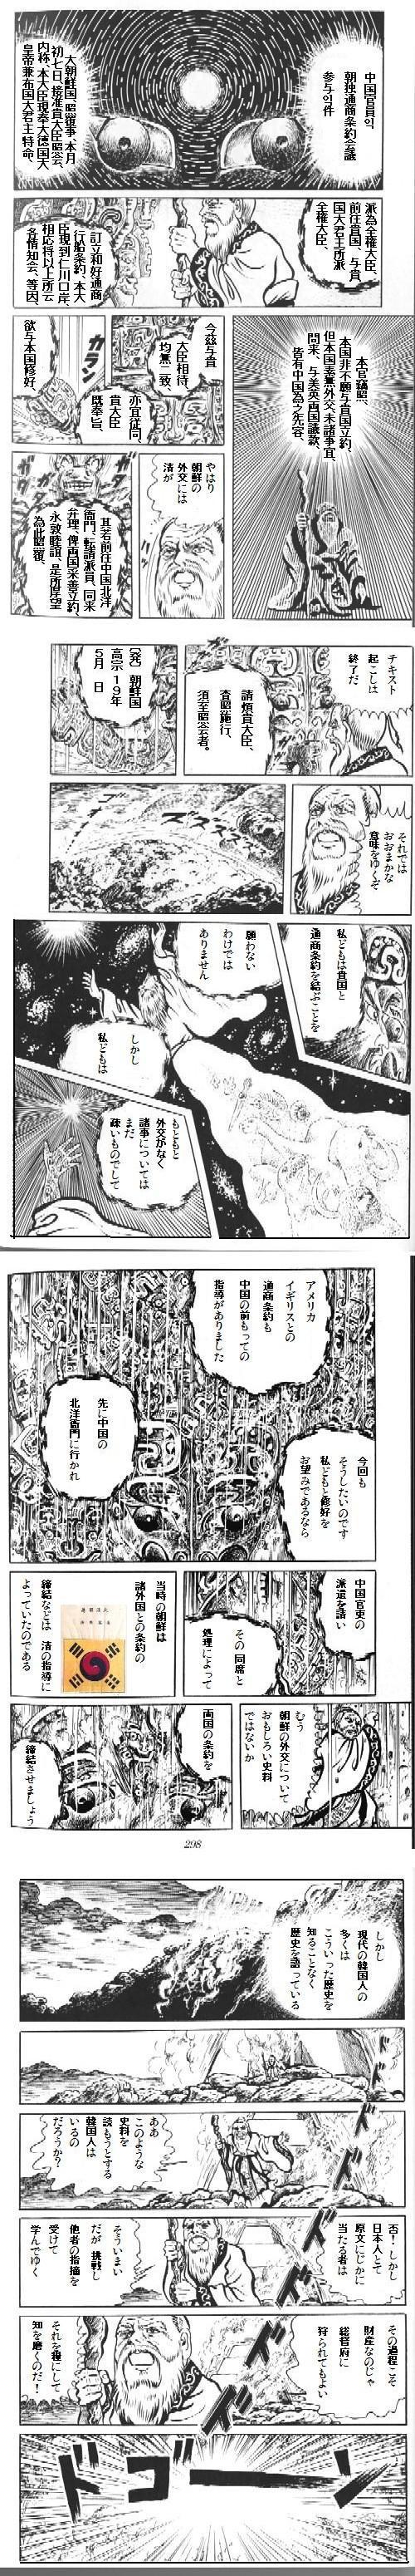 yonaki_ankoku2.jpg